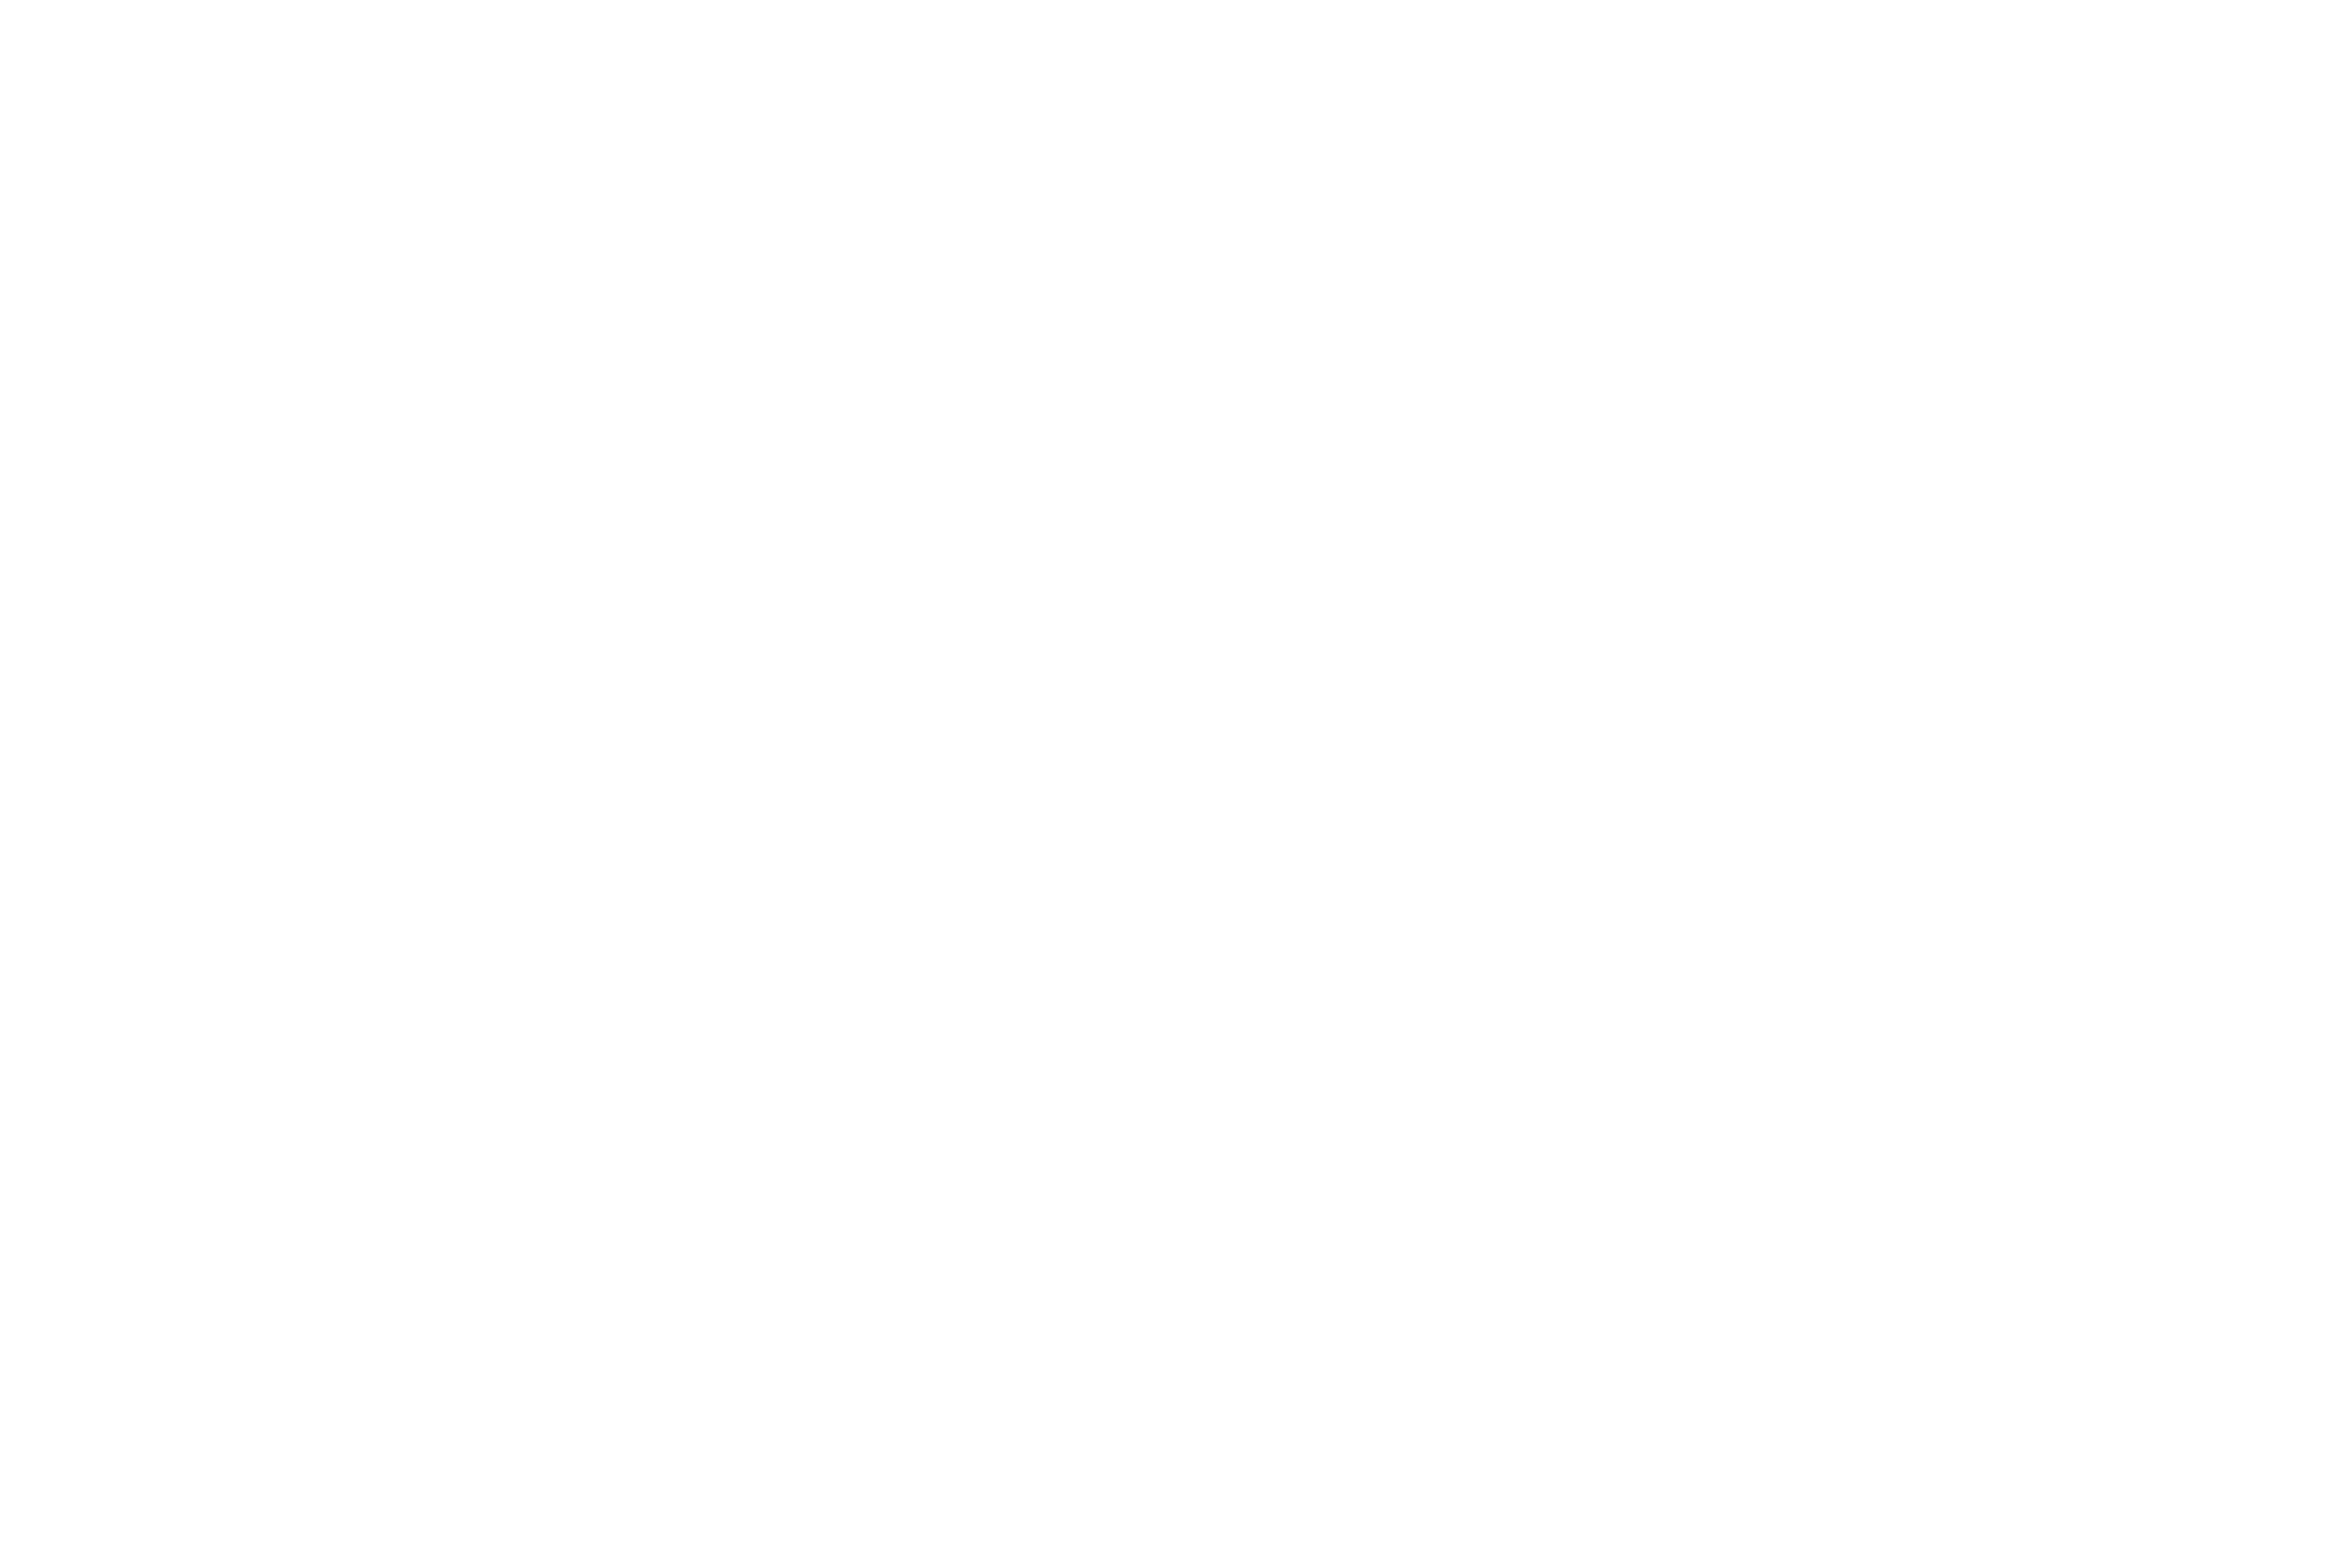 Chung cư The Landmark Swanlake Residence Ecopark